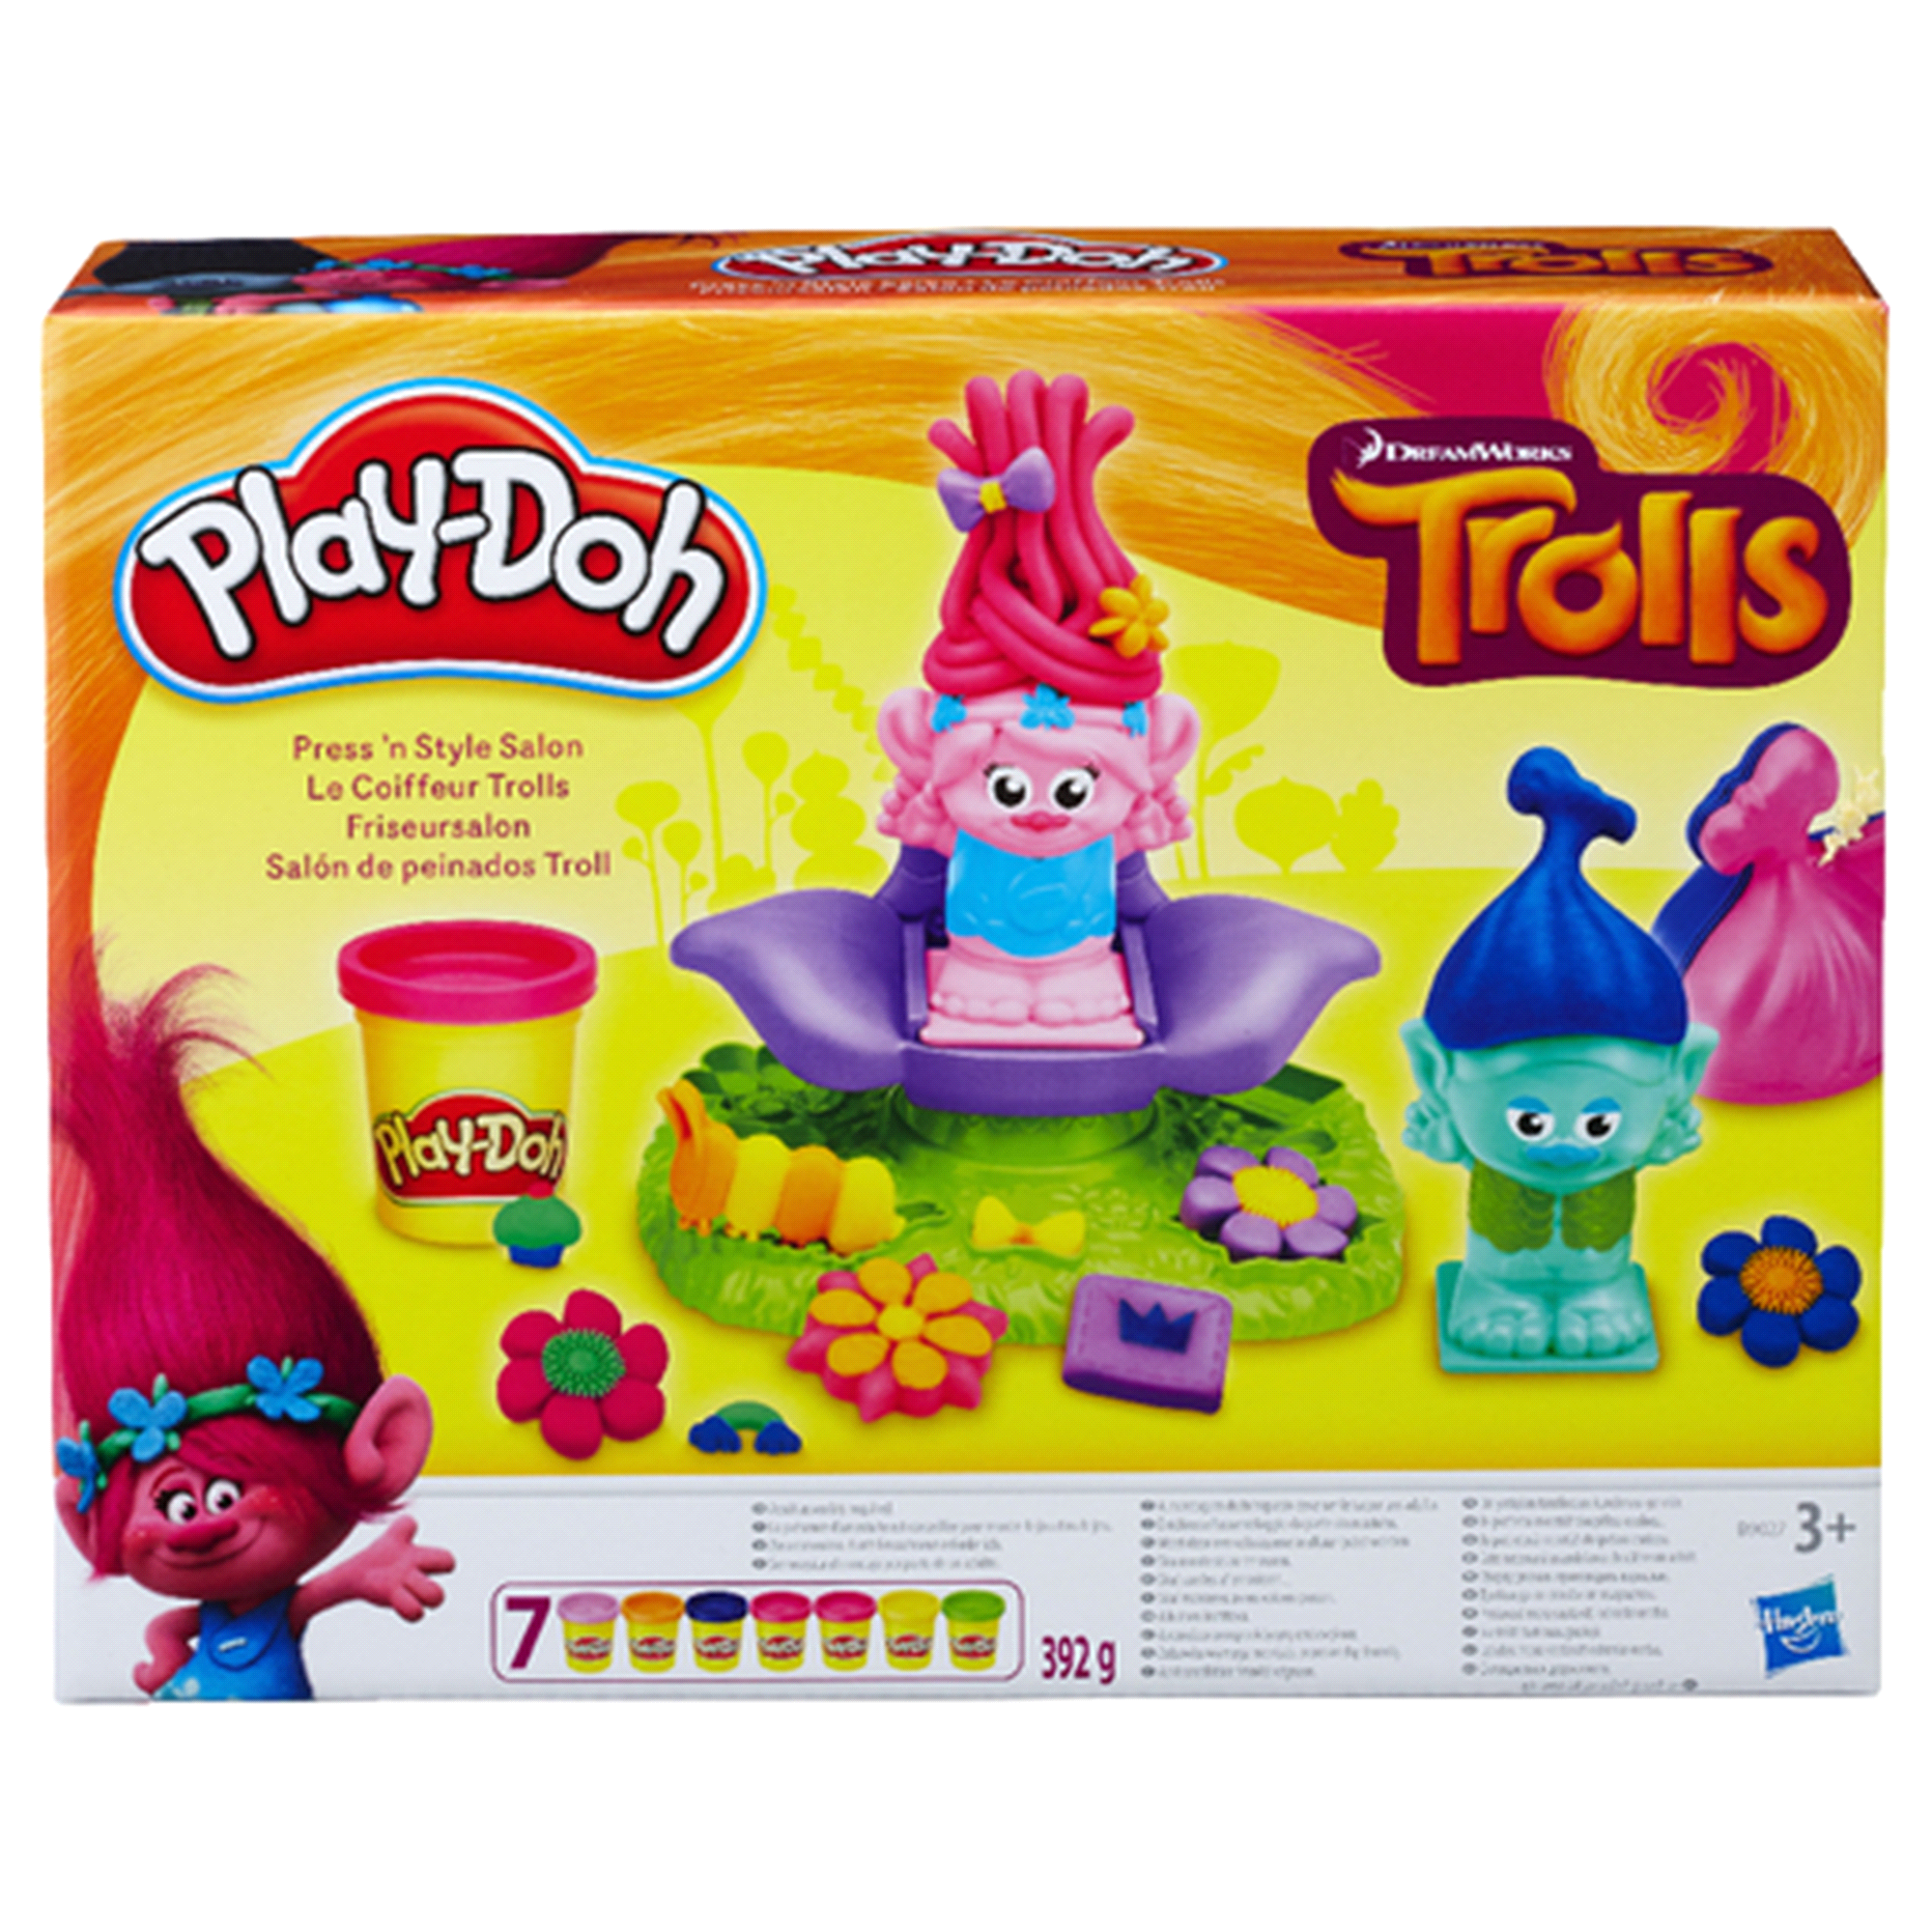 Play-Doh Dreamworks Trolls Press n Style Salon | Meijer.com